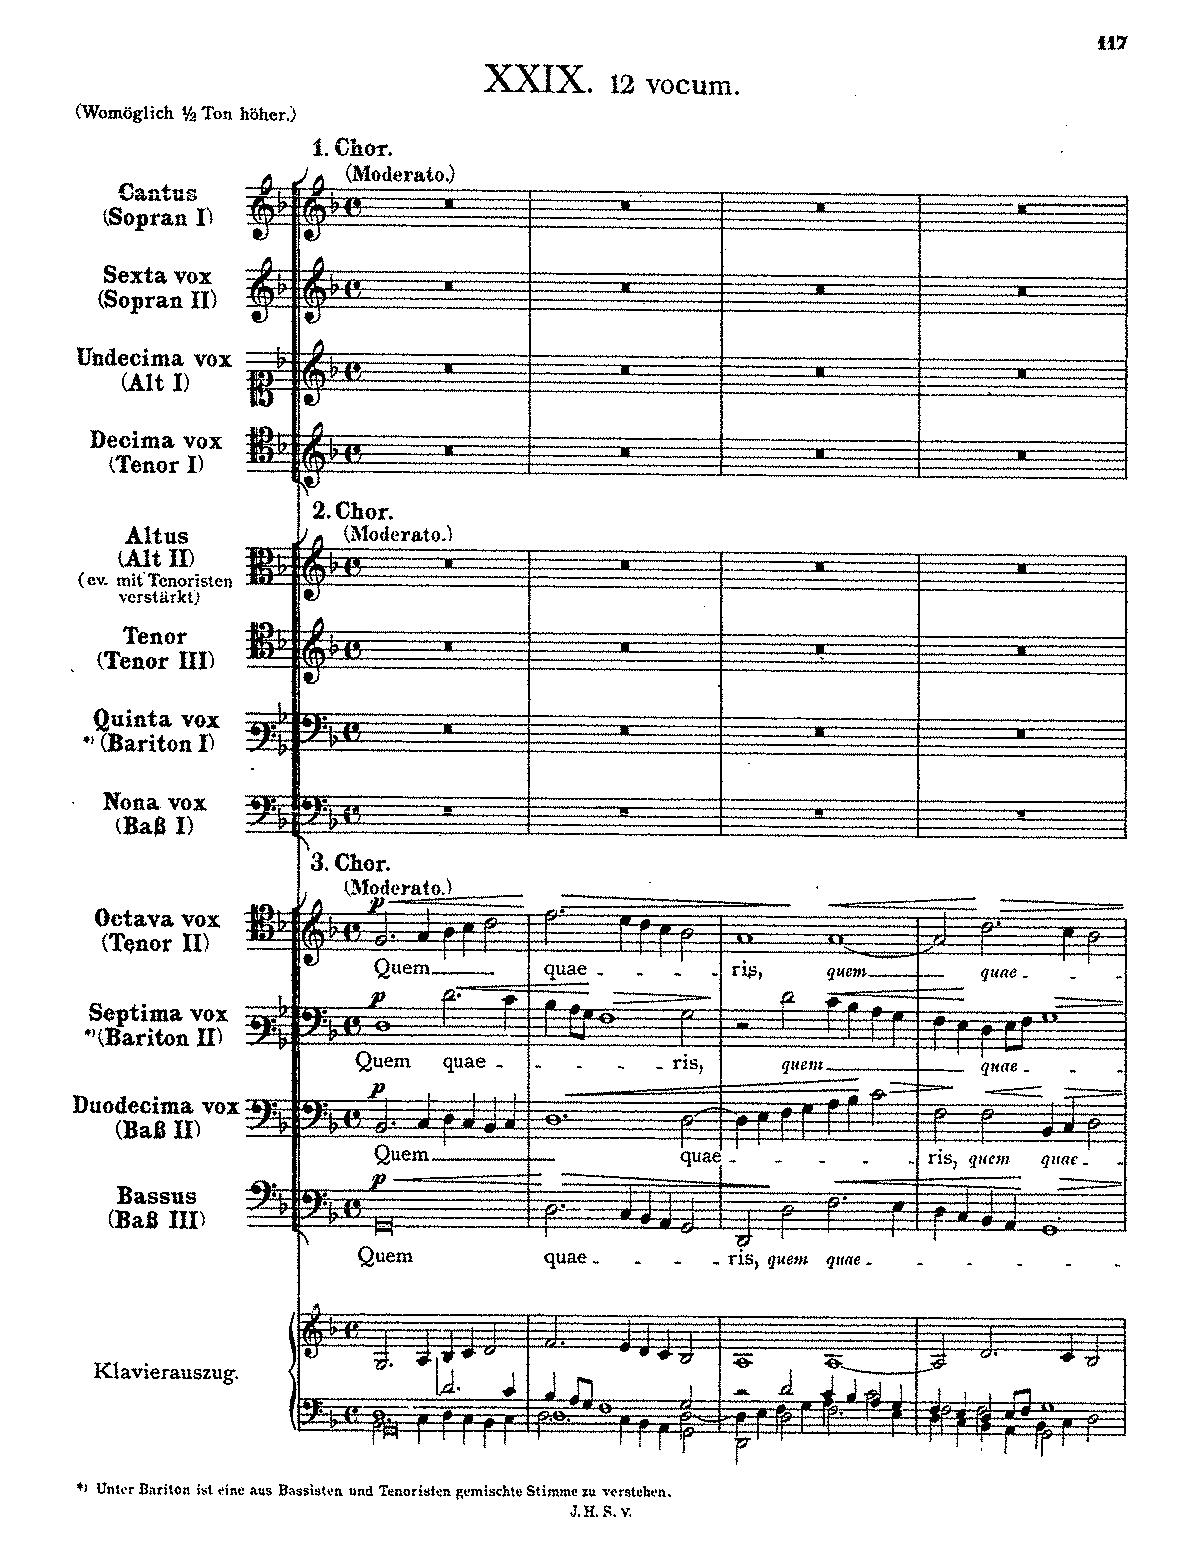 Quem quaeris, Magdalena? (Schein, Johann Hermann) - IMSLP/Petrucci